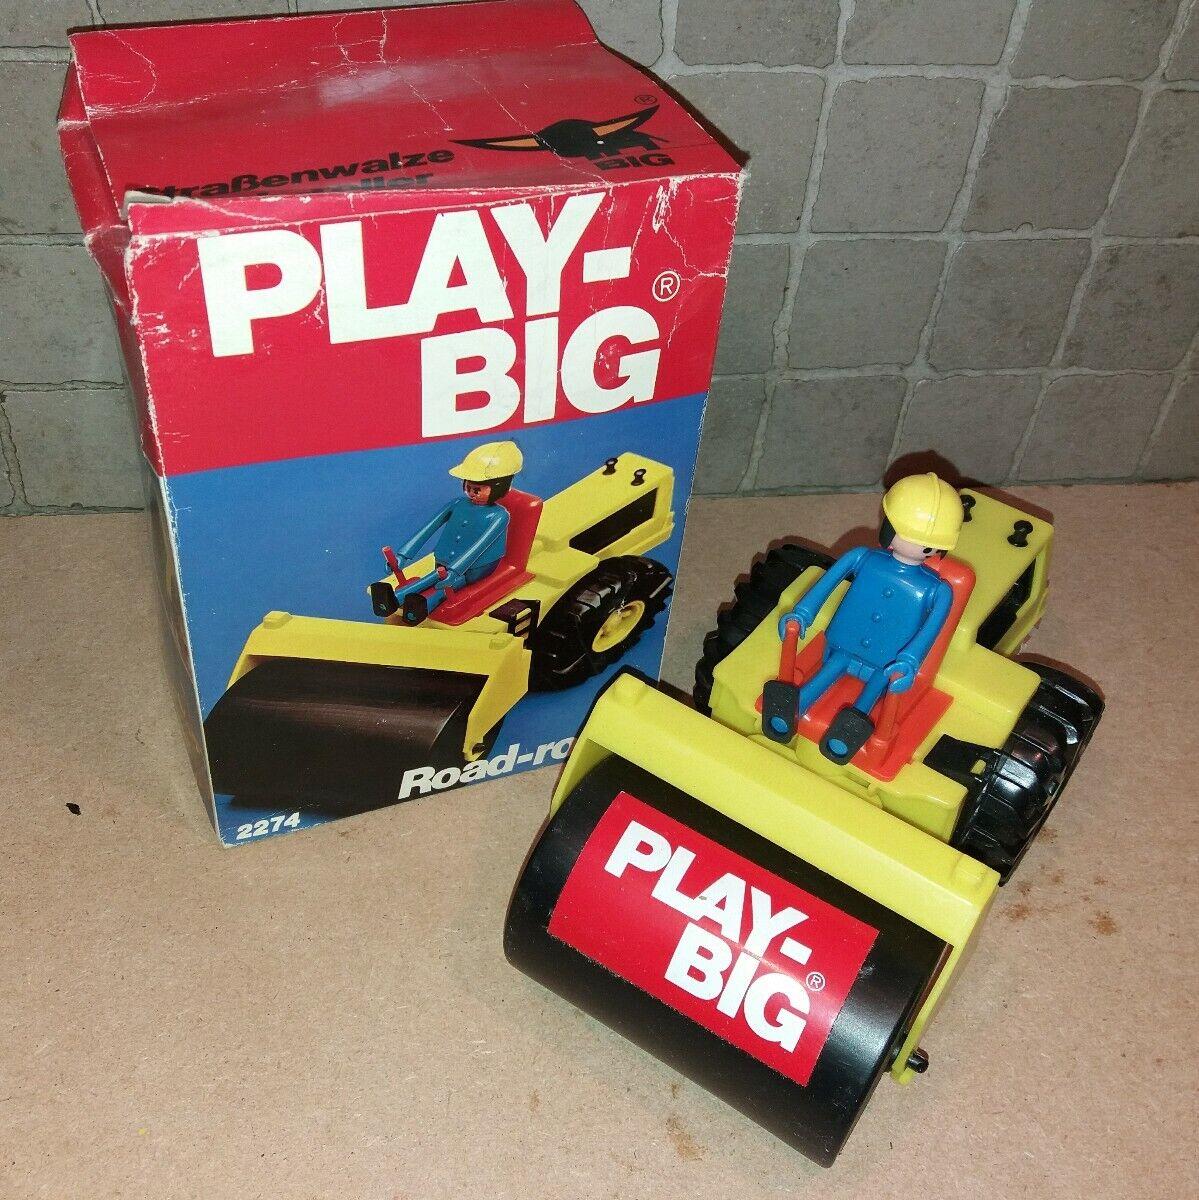 Playbig Playbig Playbig 2274   engin de chantier, rouleau. 55e274